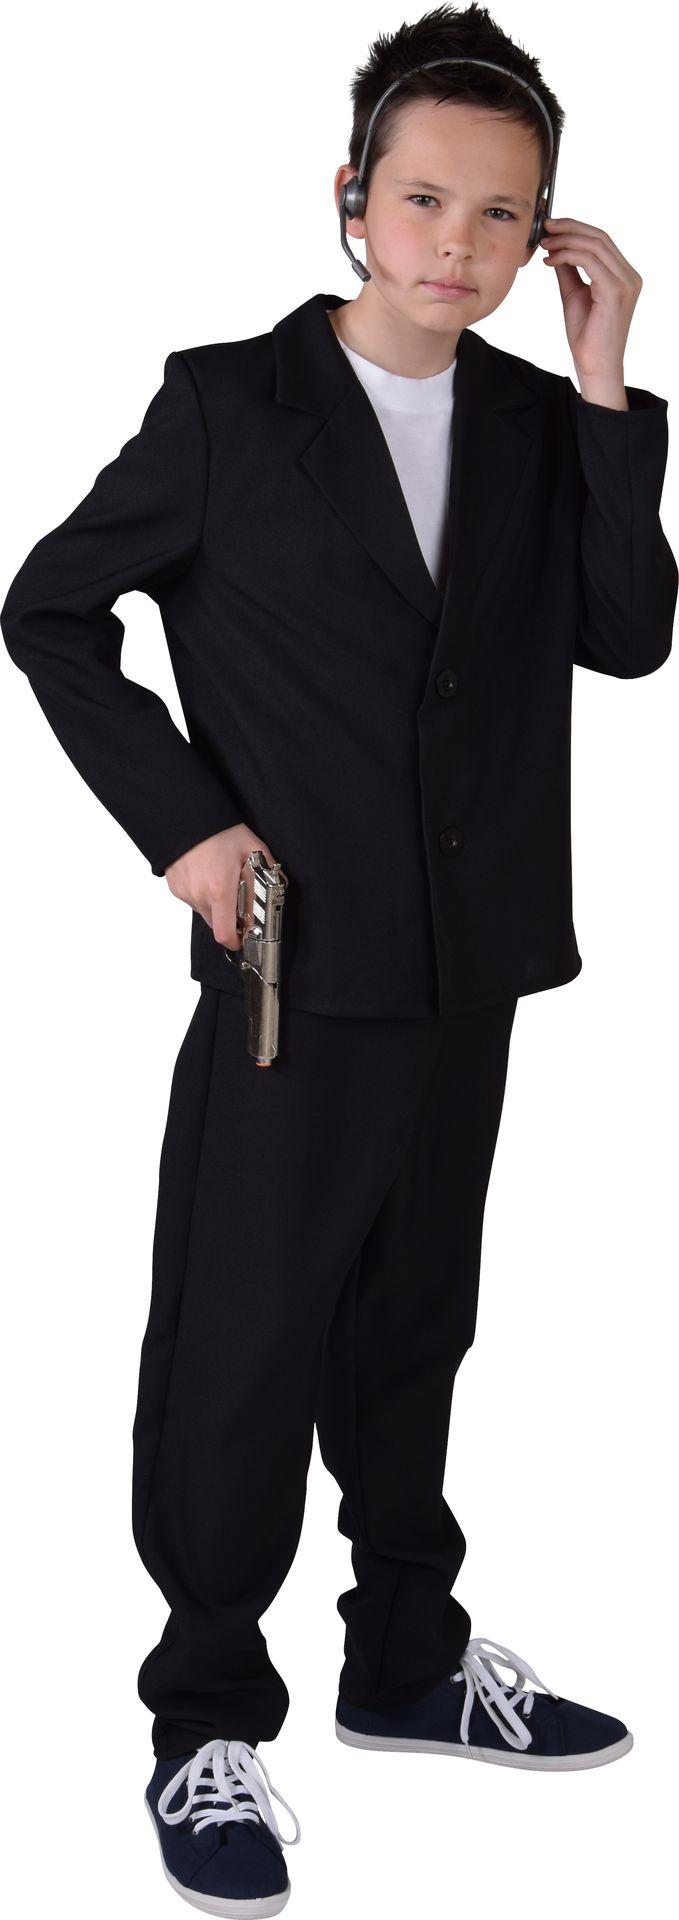 Bodyguard outfit jongens